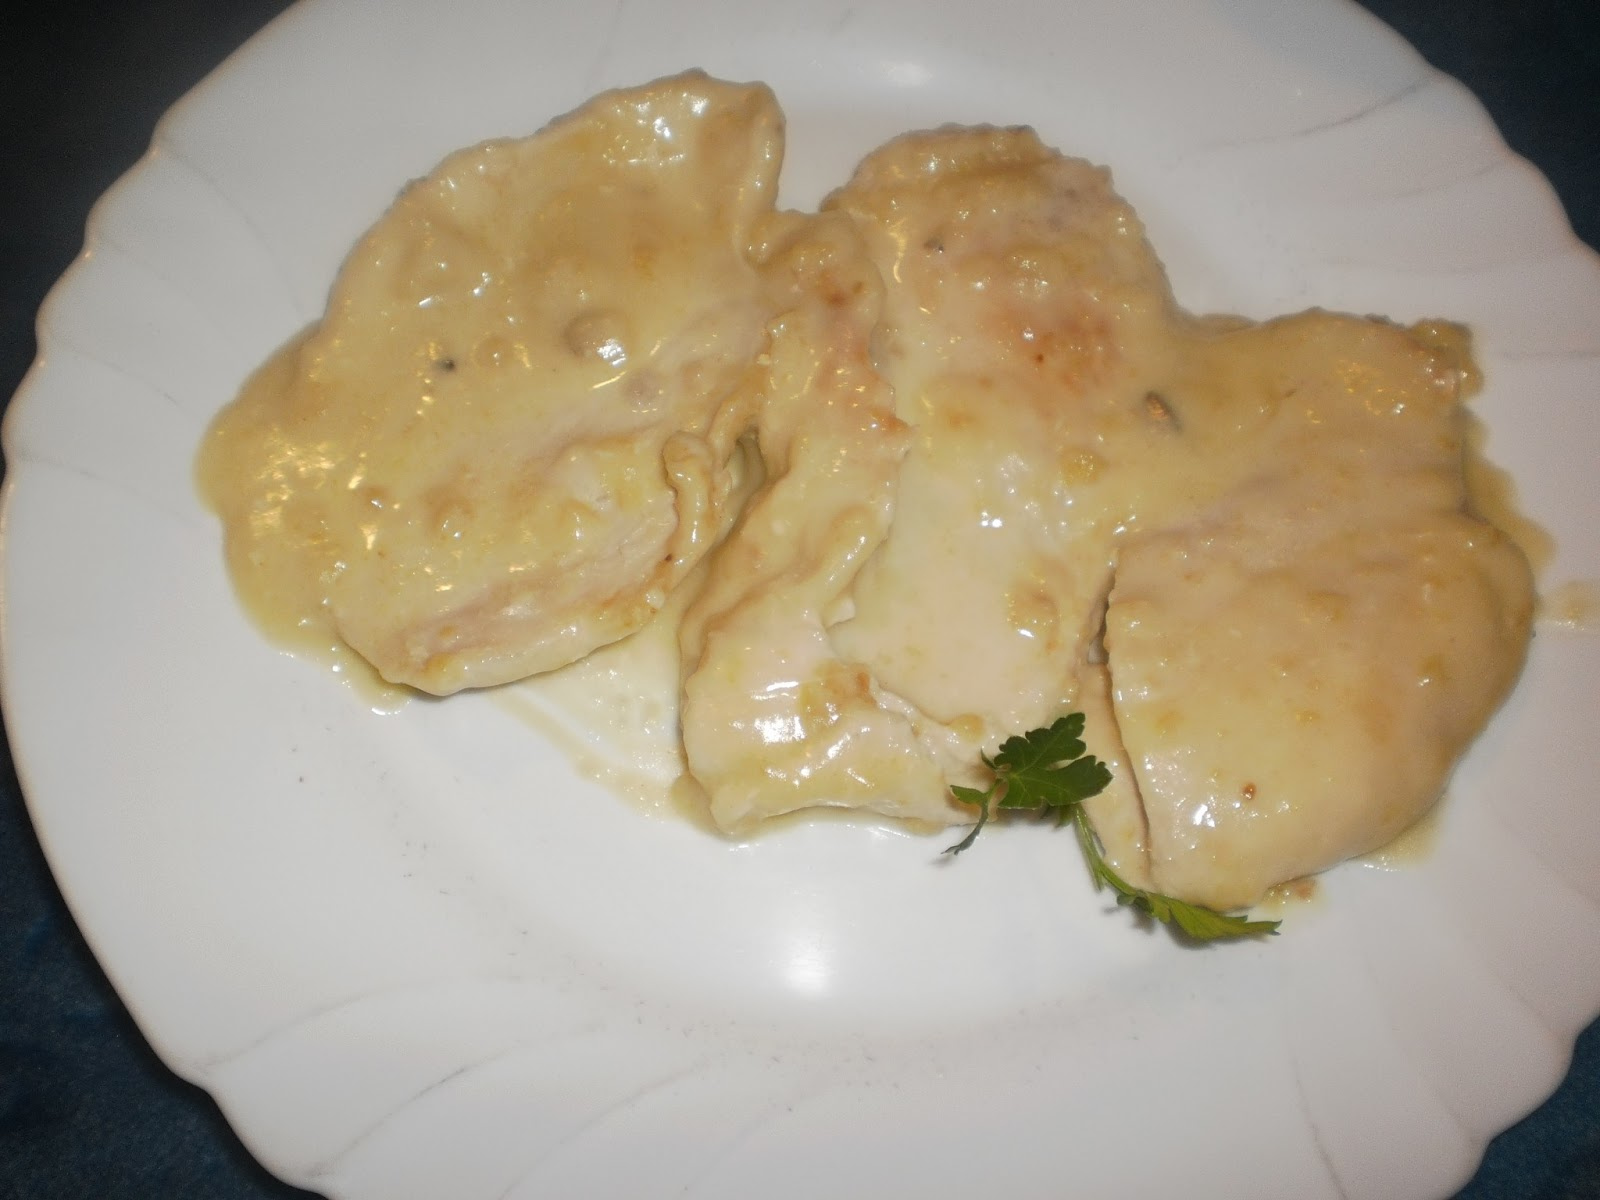 Pan frito o reban s pechugas al lim n - Pechugas al limon ...